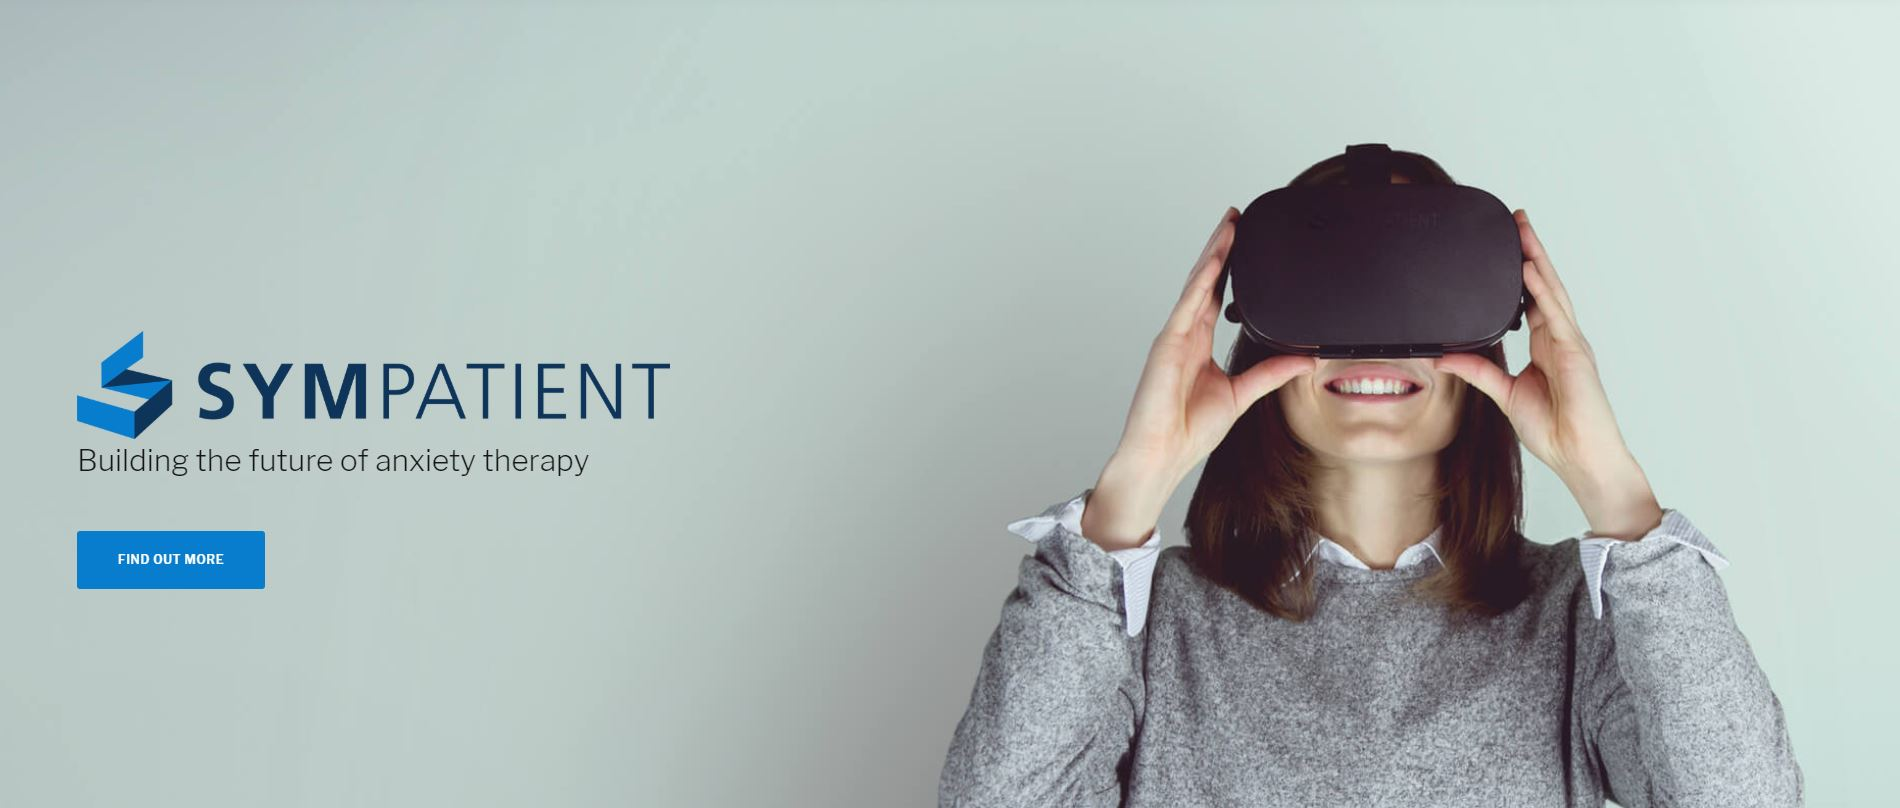 VR医疗创企Sympatient宣布完成160万欧元种子轮融资